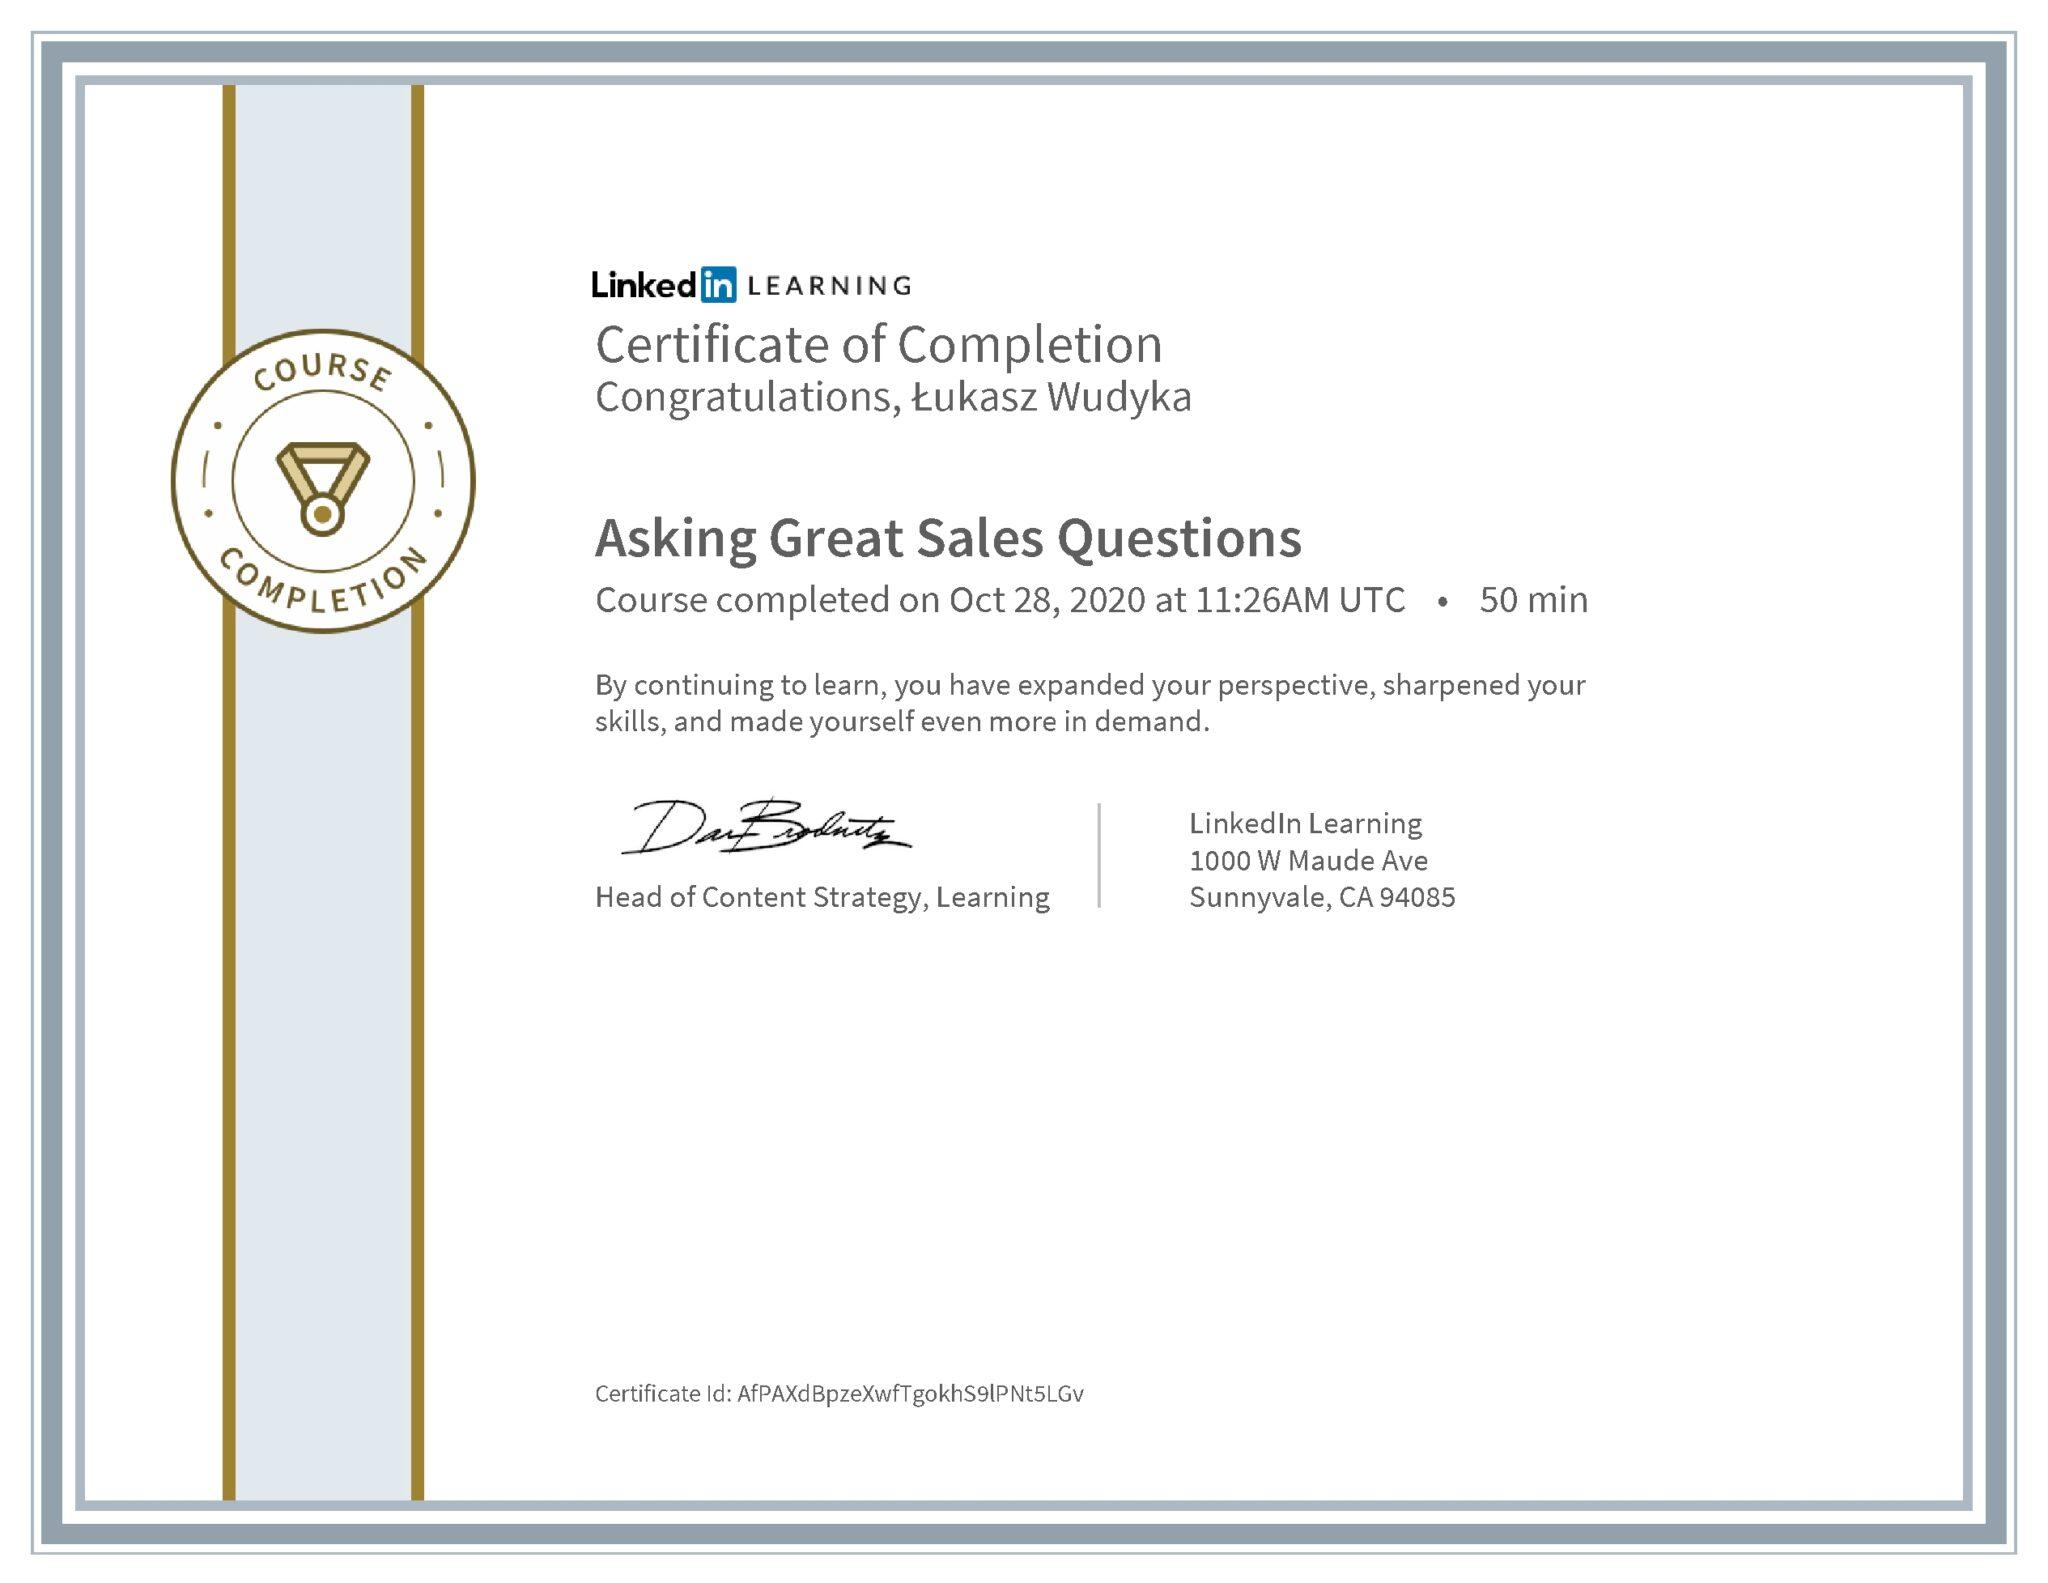 Łukasz Wudyka certyfikat LinkedIn Asking Great Sales Questions